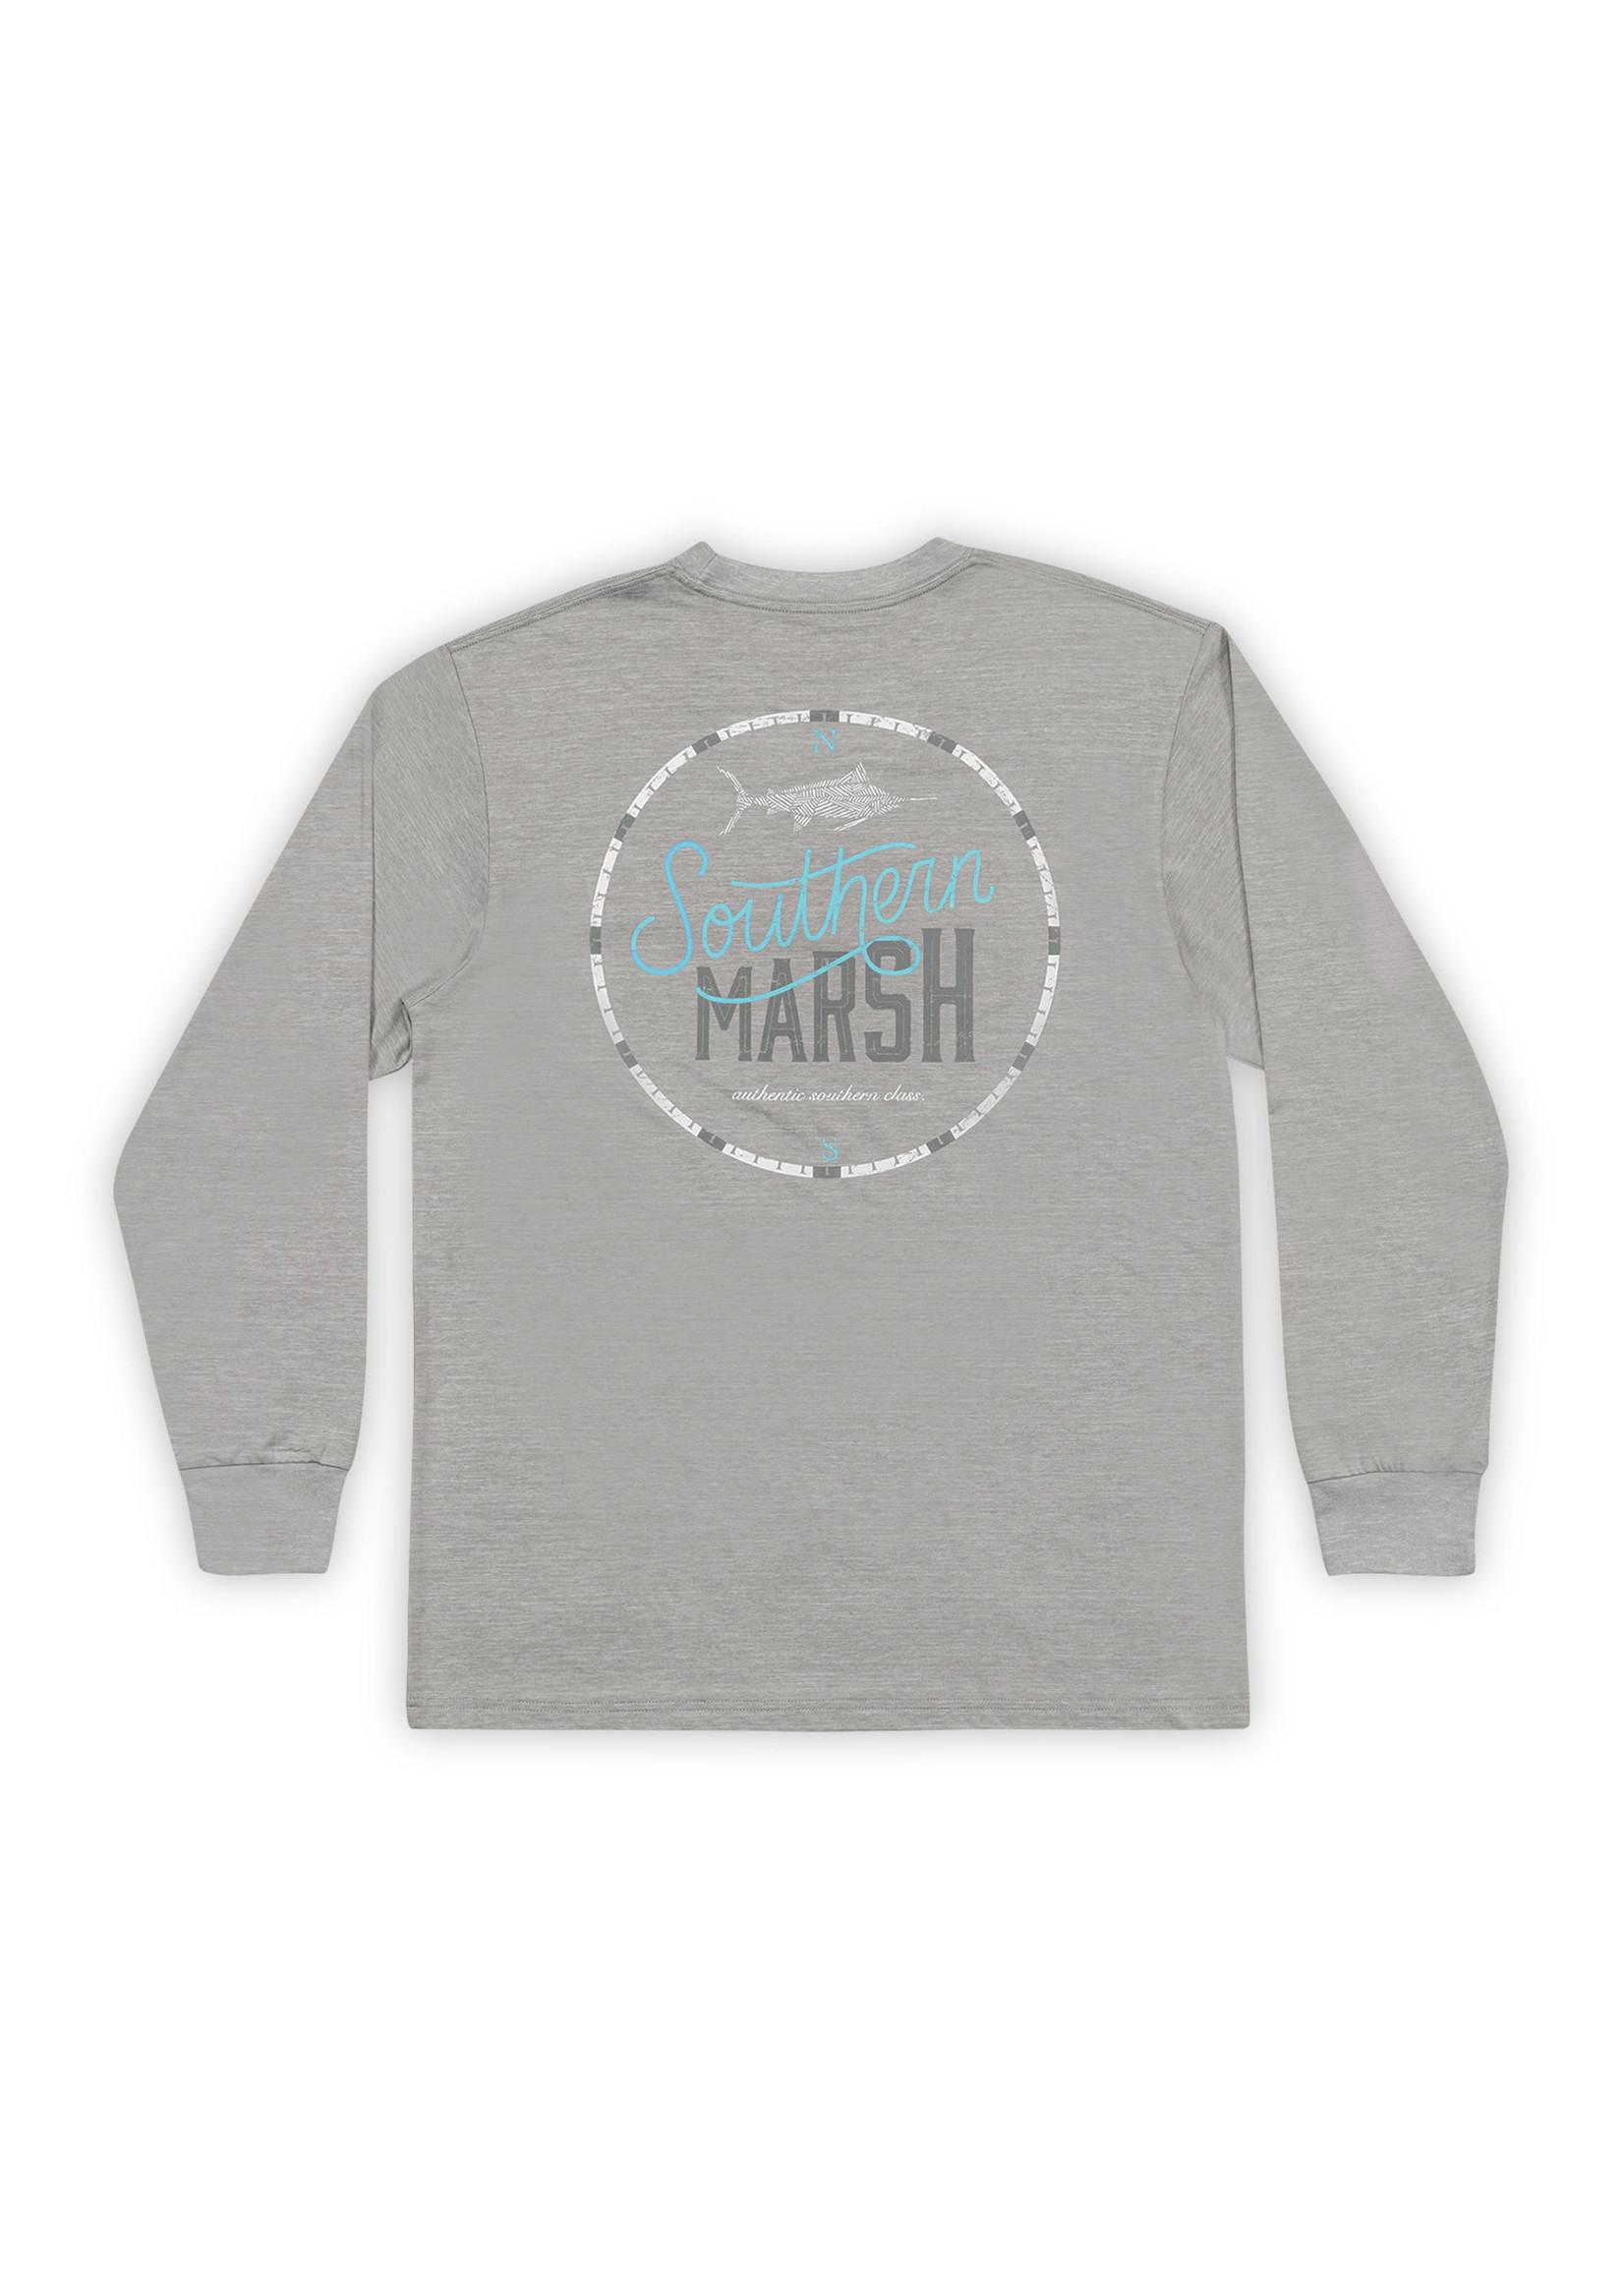 Southern Marsh FieldTec™ Heathered Tee - Marlin Time - Long Sleeve